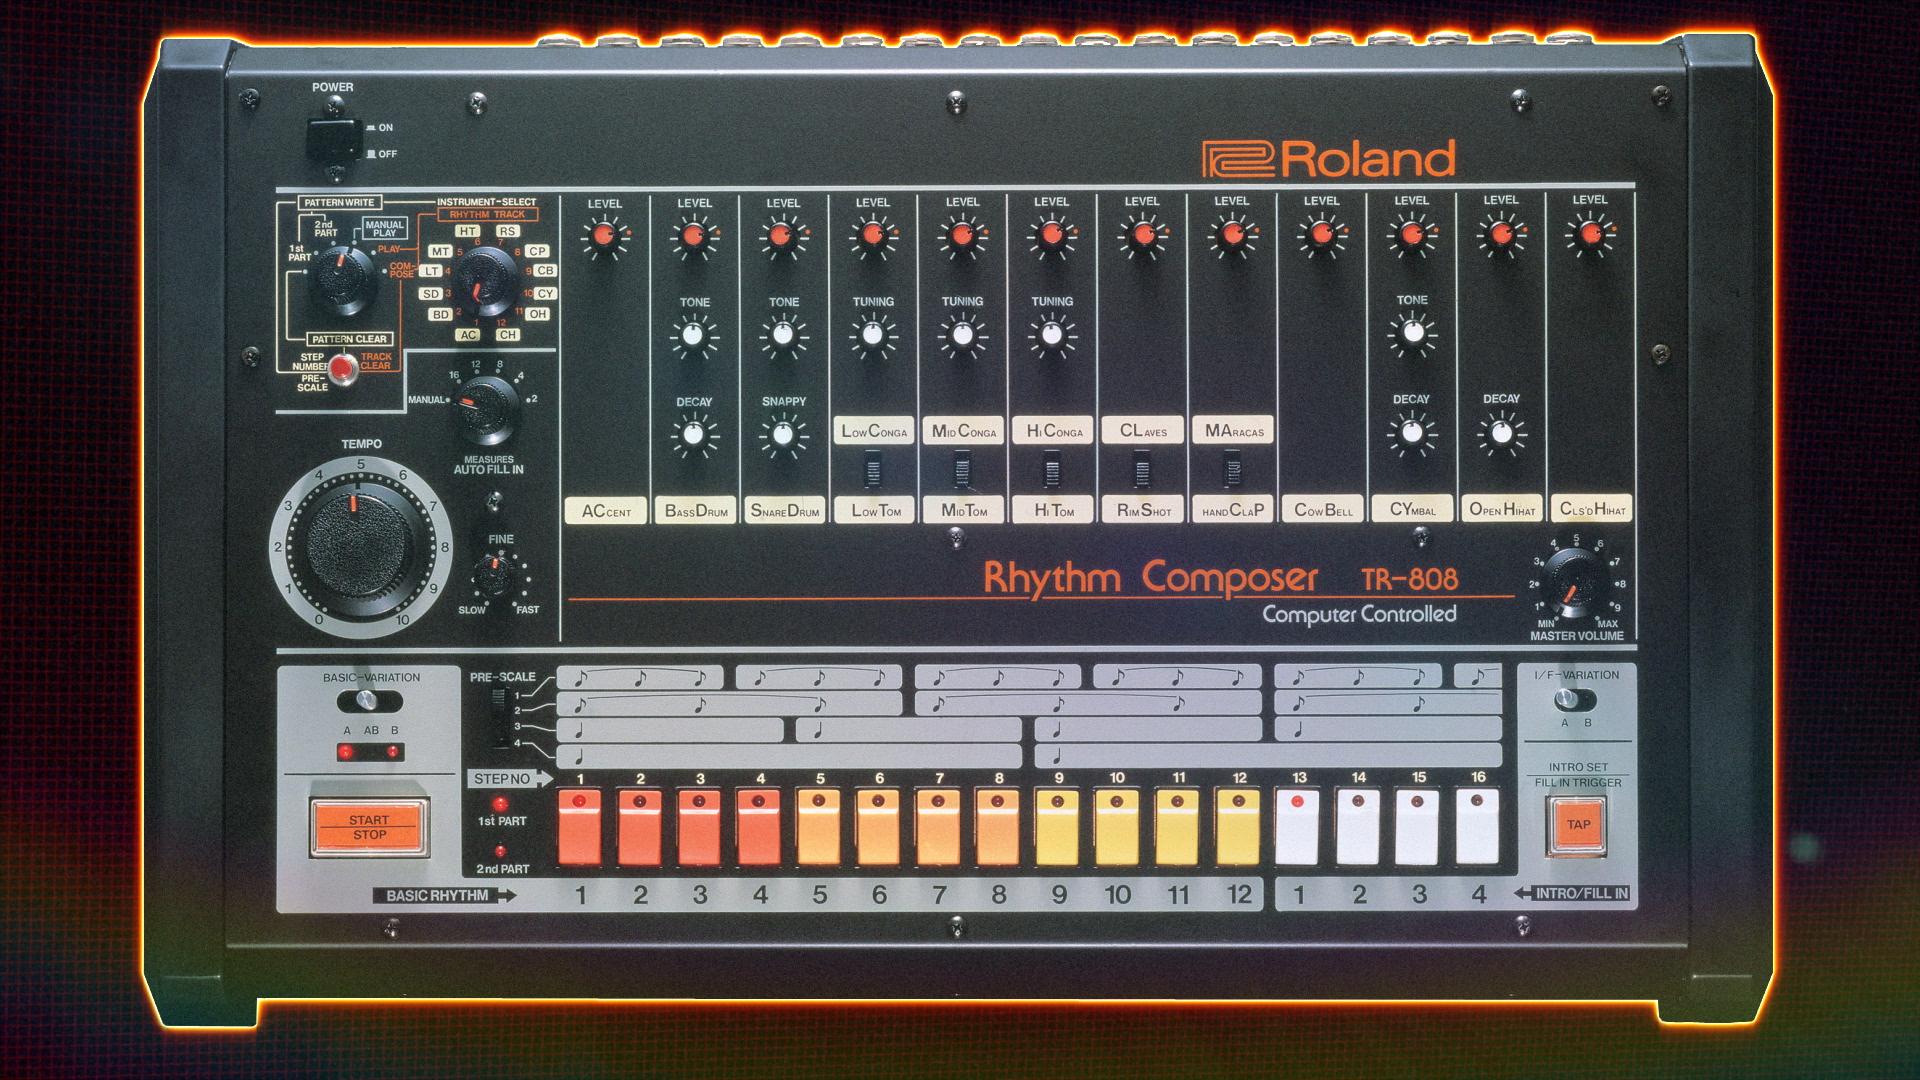 8 Ways the 808 Drum Machine Shaped Pop Music